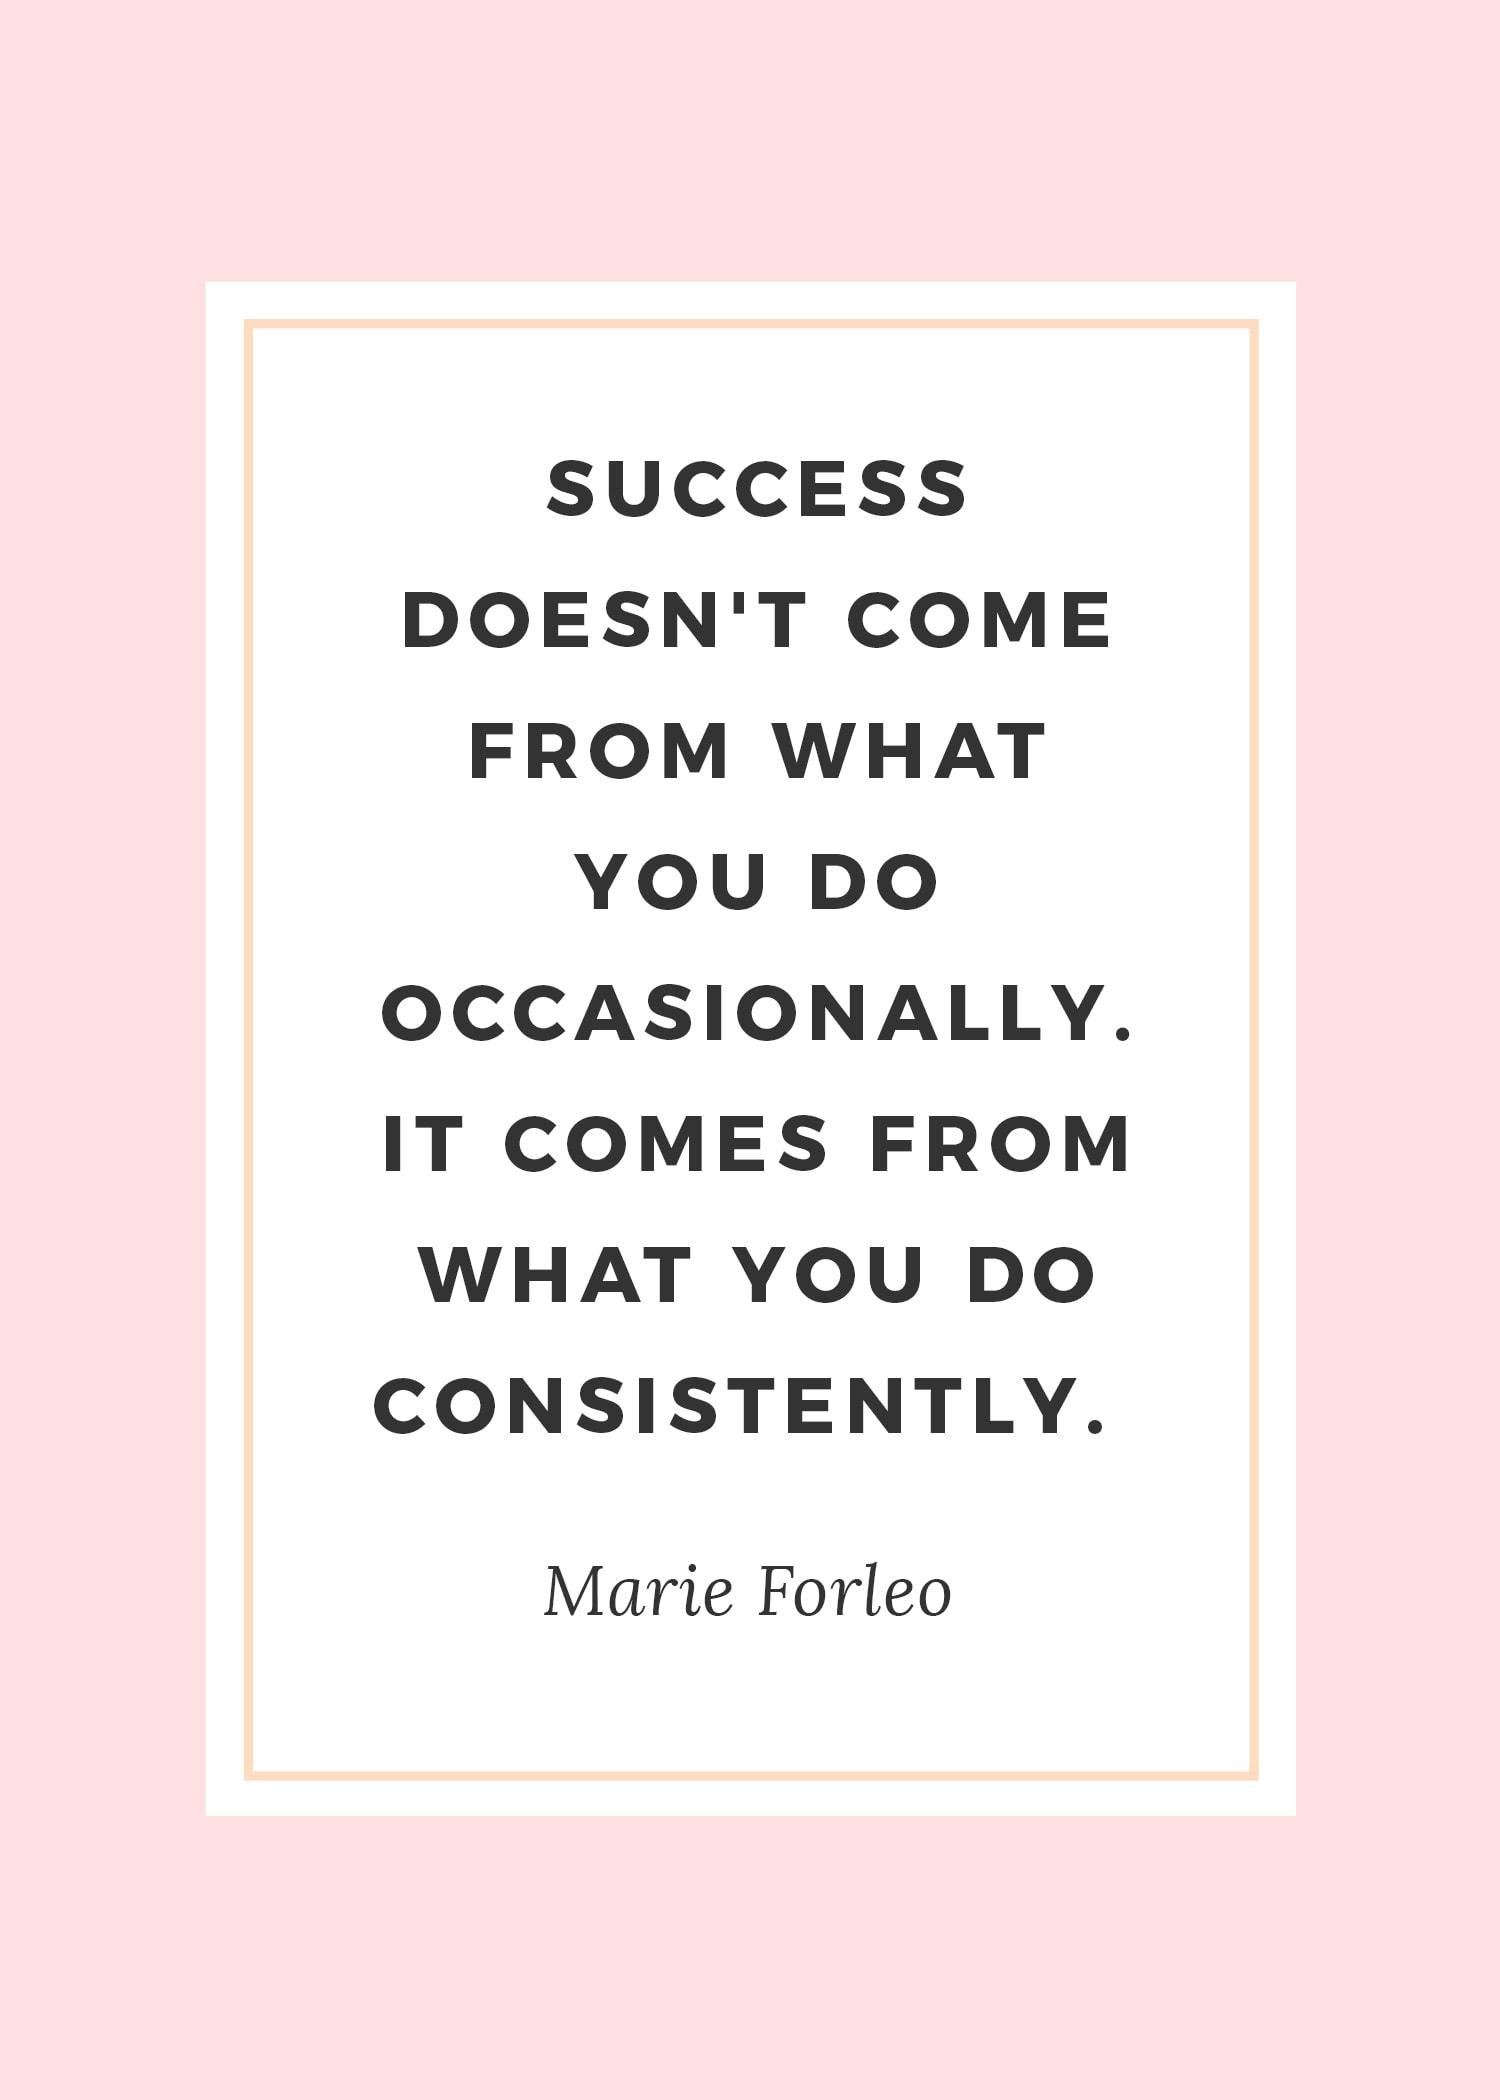 Hustle Hard Girl Wallpaper 10 Quotes For Every Girl Boss Ashley Brooke Nicholas